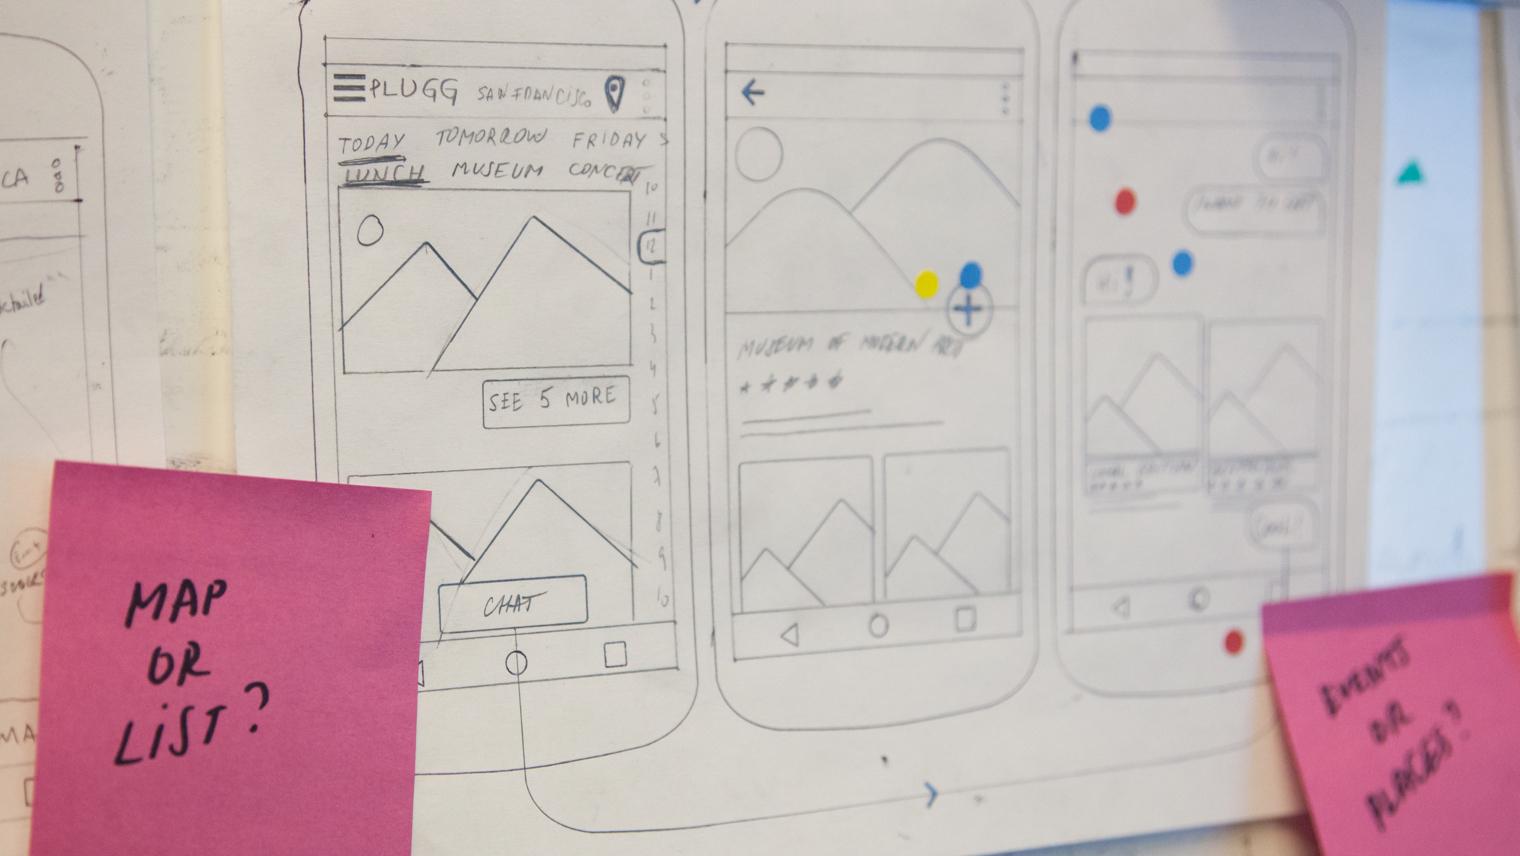 sketch of mobile app prototype